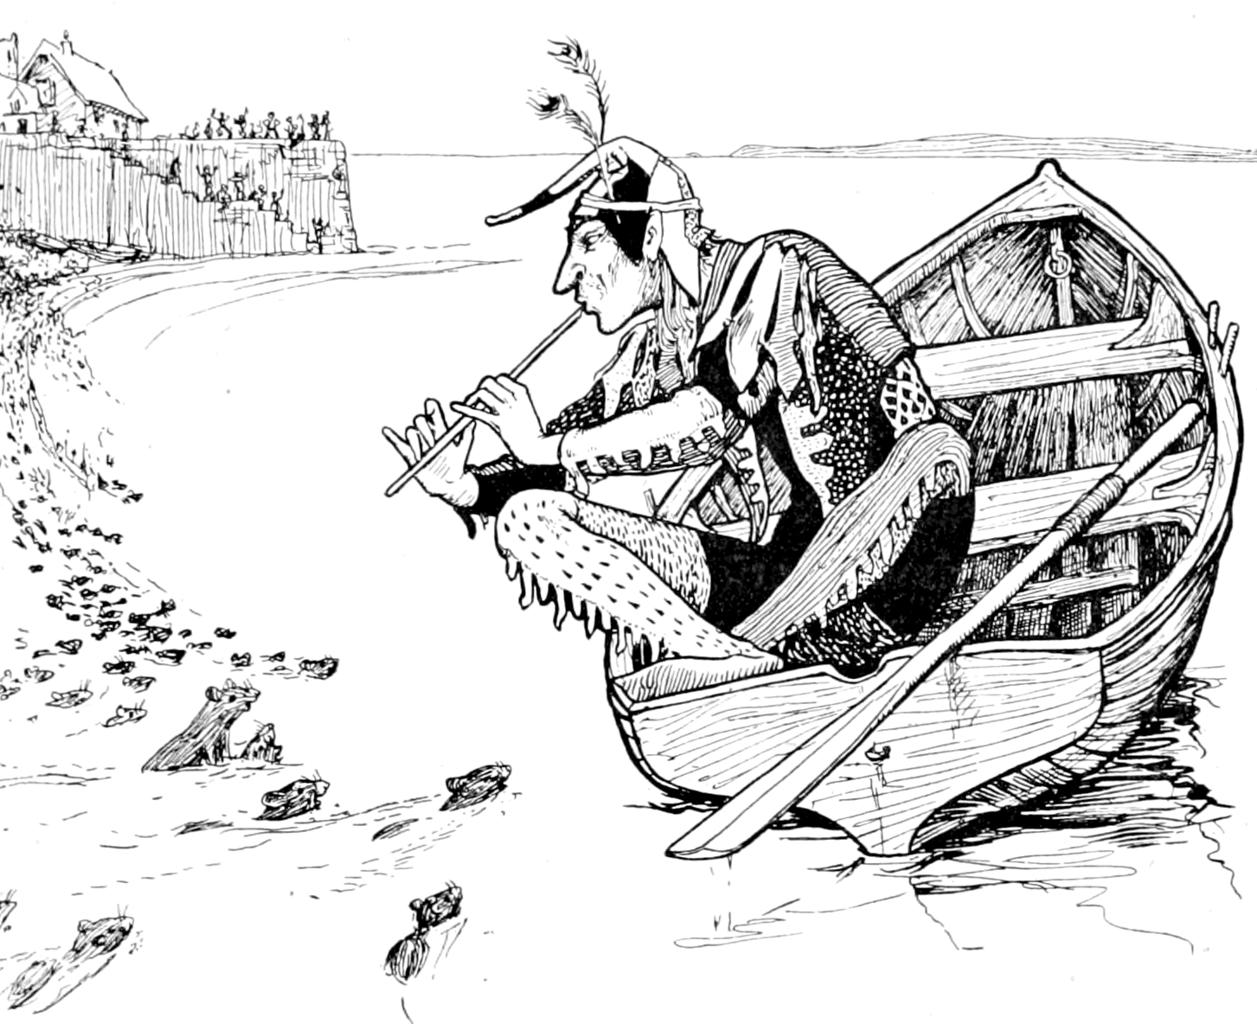 Fairy Tale Fandom: The Stuff of Legends!: The Pied Piper